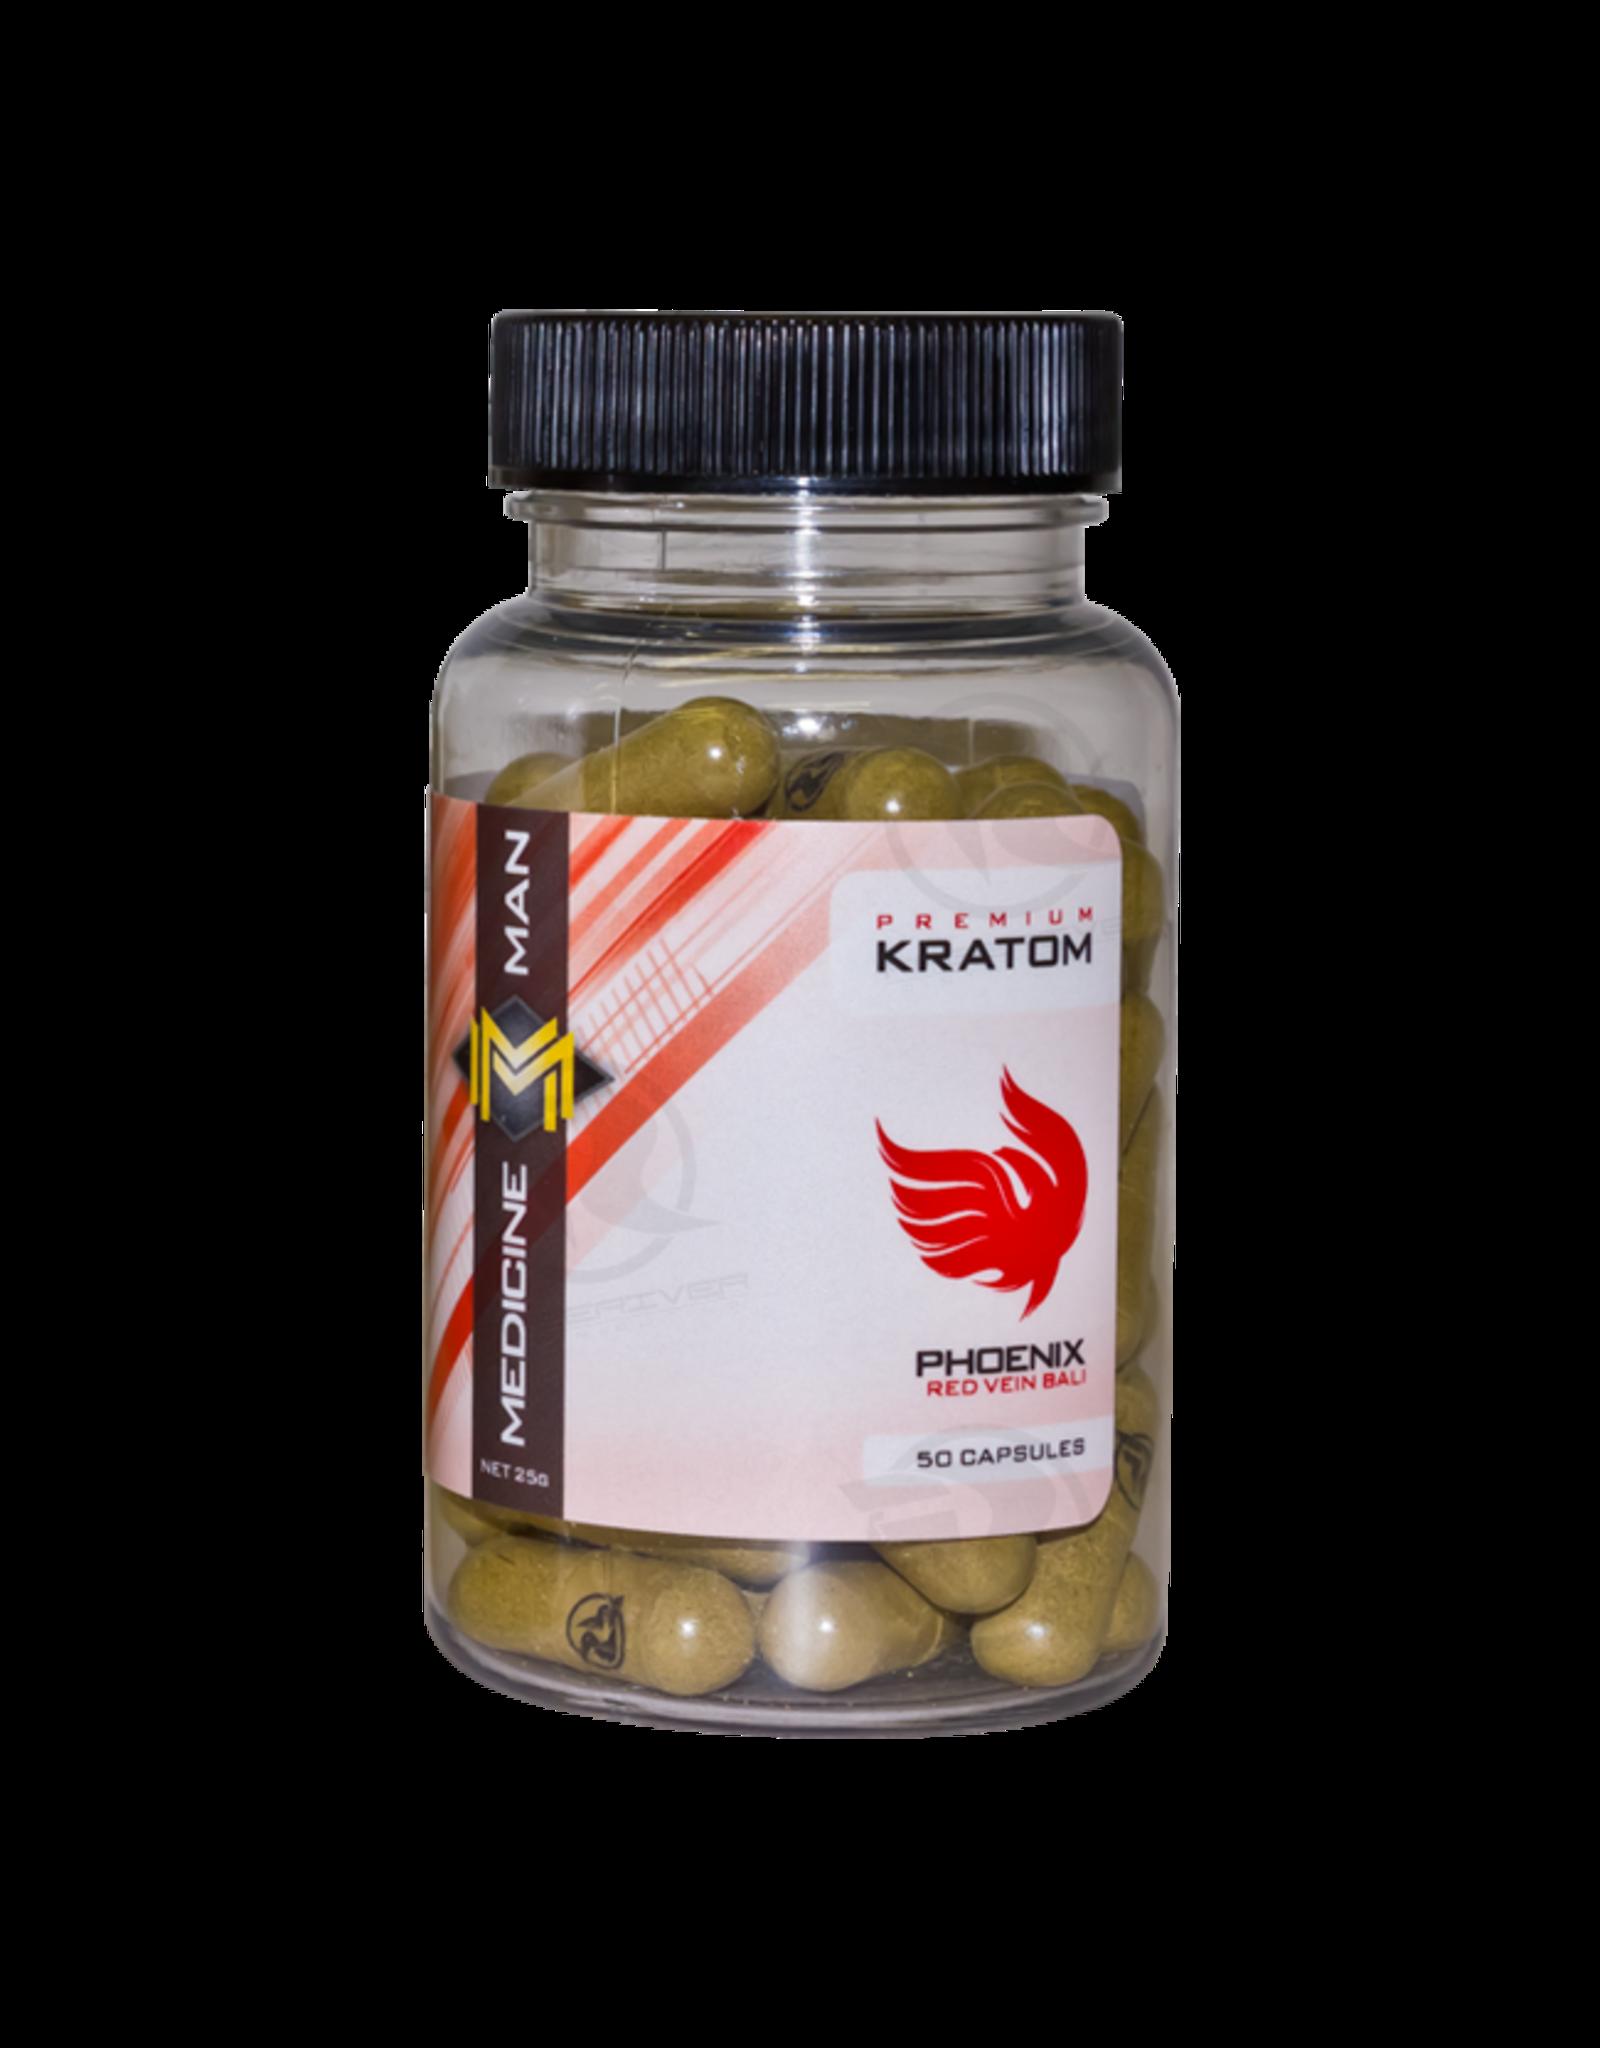 Medicine Man Kratom Phoenix 50 Caps 6pk